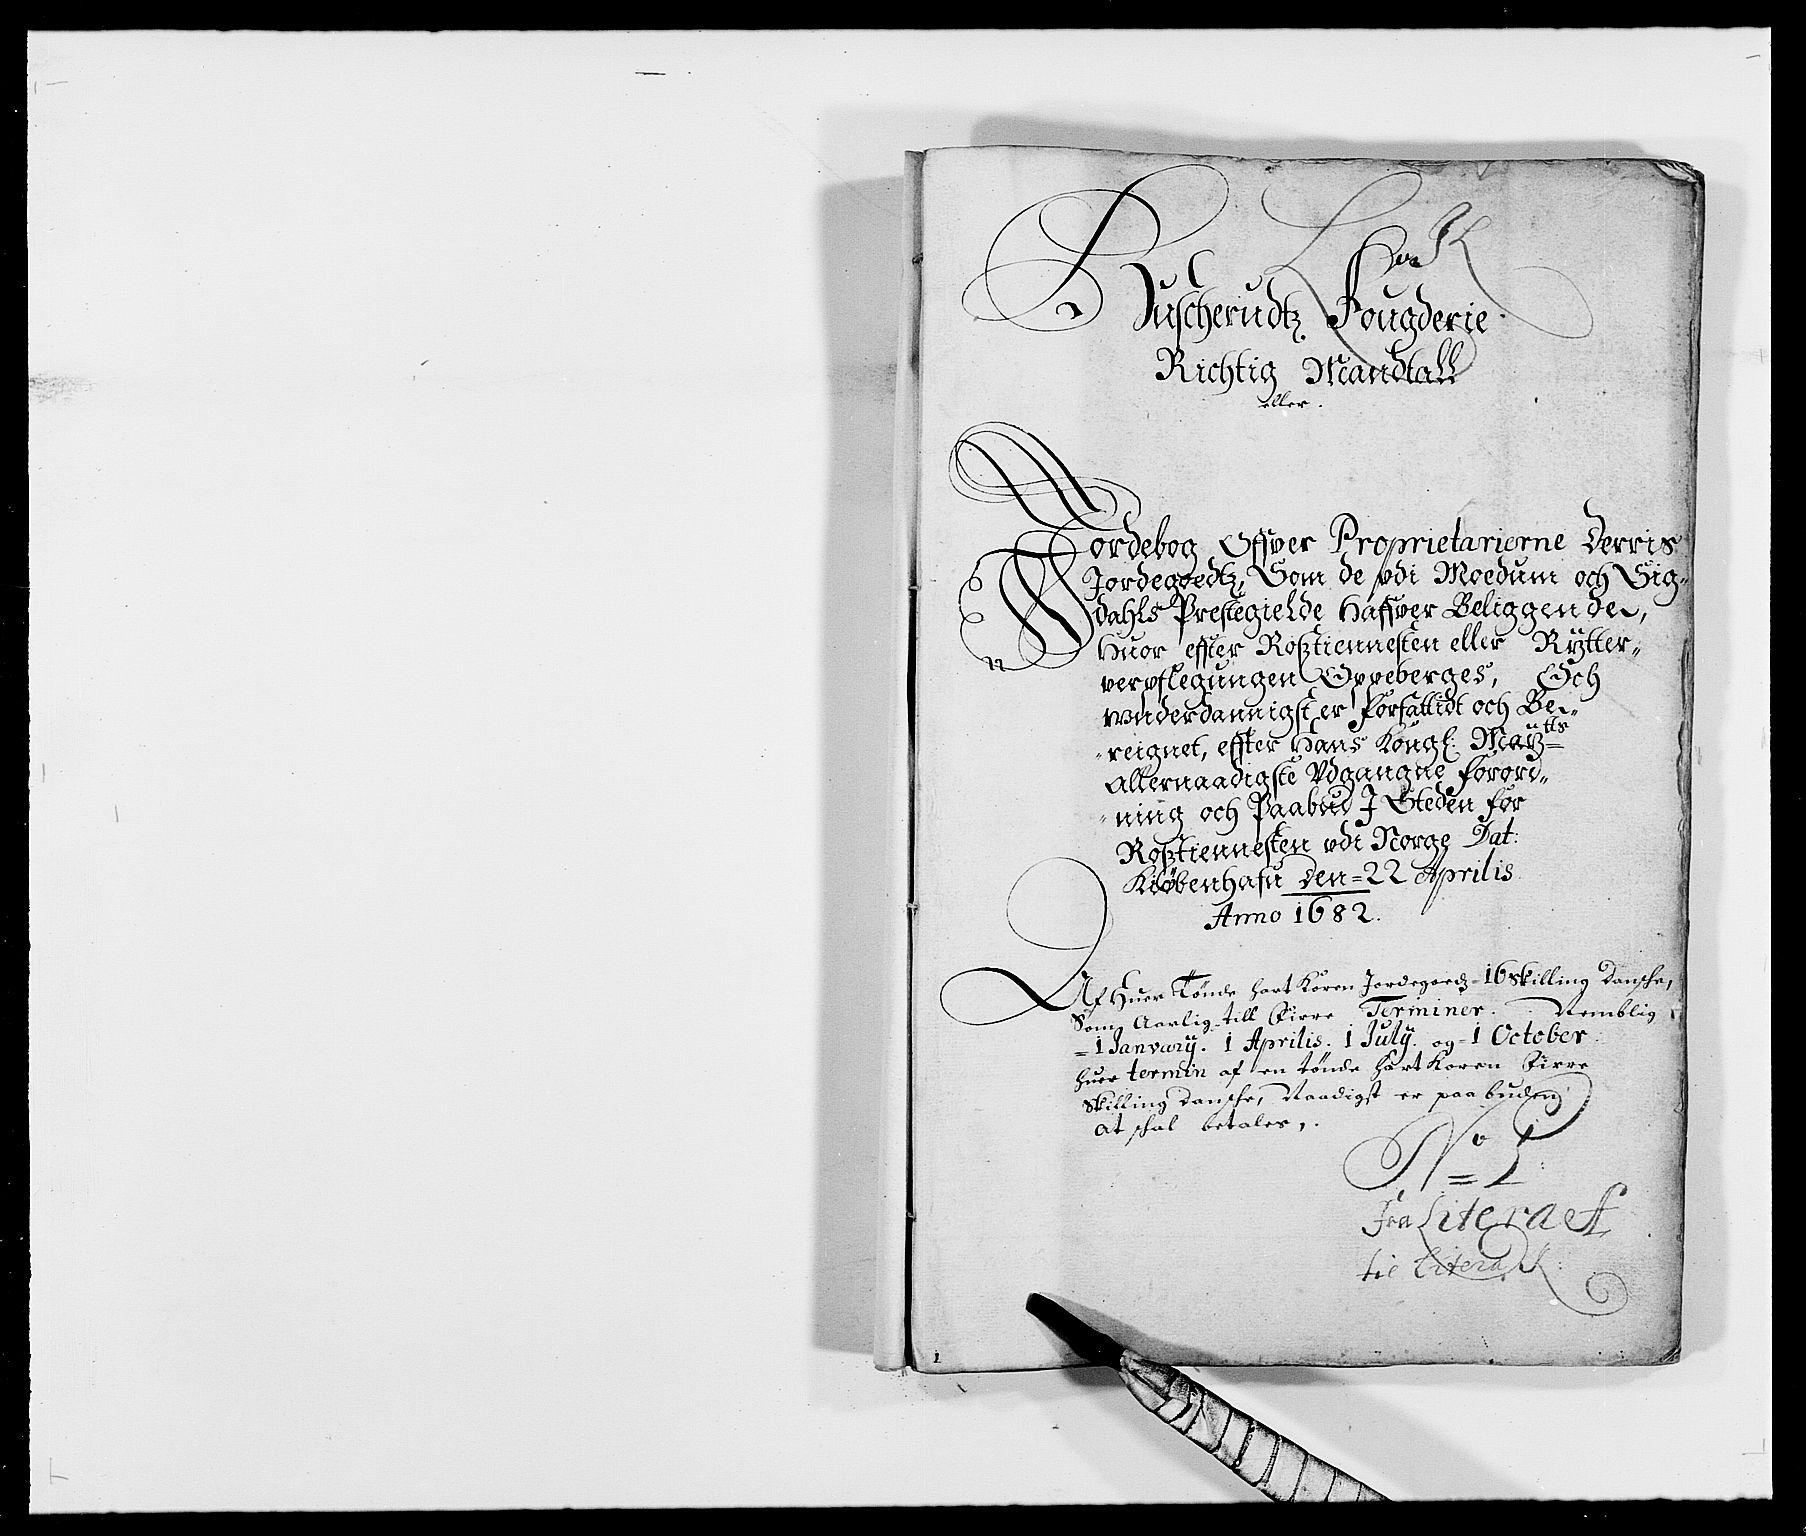 RA, Rentekammeret inntil 1814, Reviderte regnskaper, Fogderegnskap, R25/L1676: Fogderegnskap Buskerud, 1682, s. 156